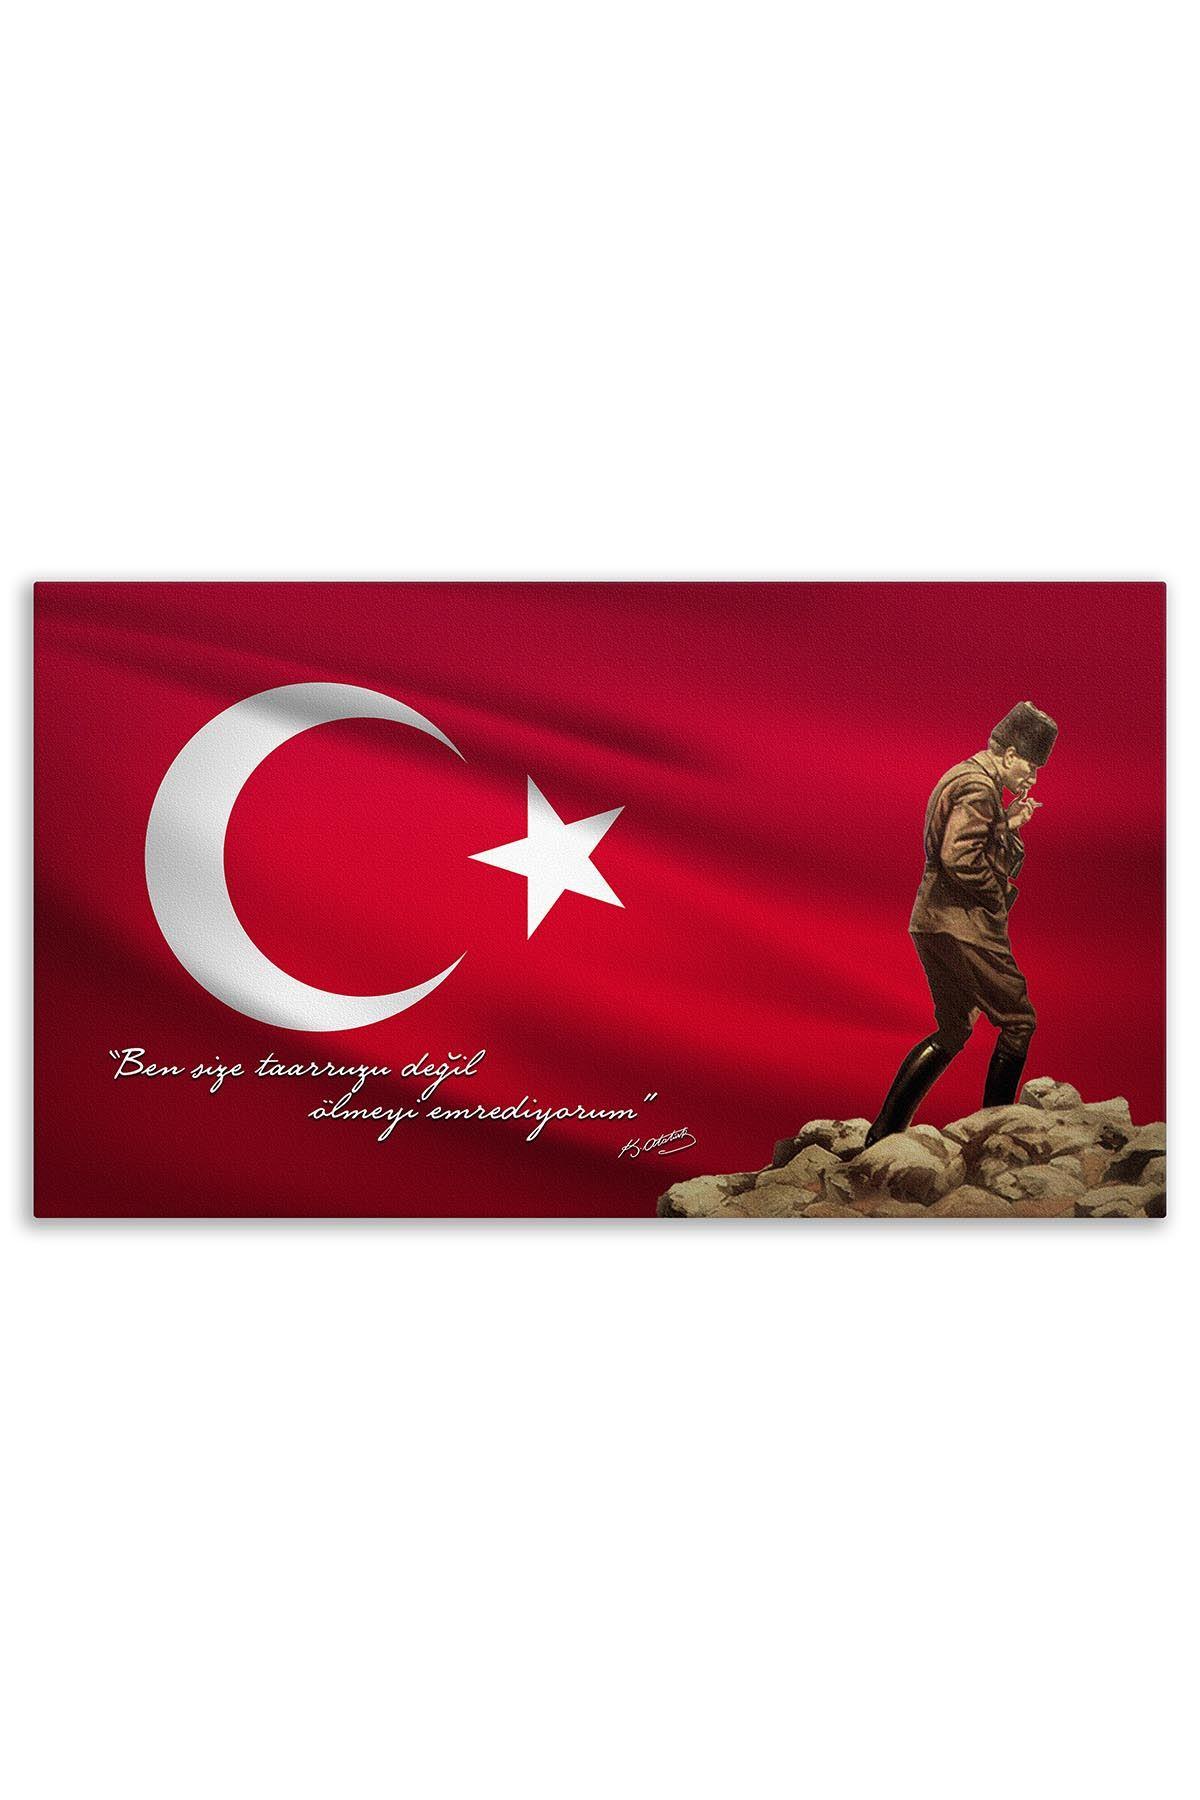 Ataturk In Gallipoli Canvas Board | Printed Canvas Board | Customized Canvas Board |Digital Printing